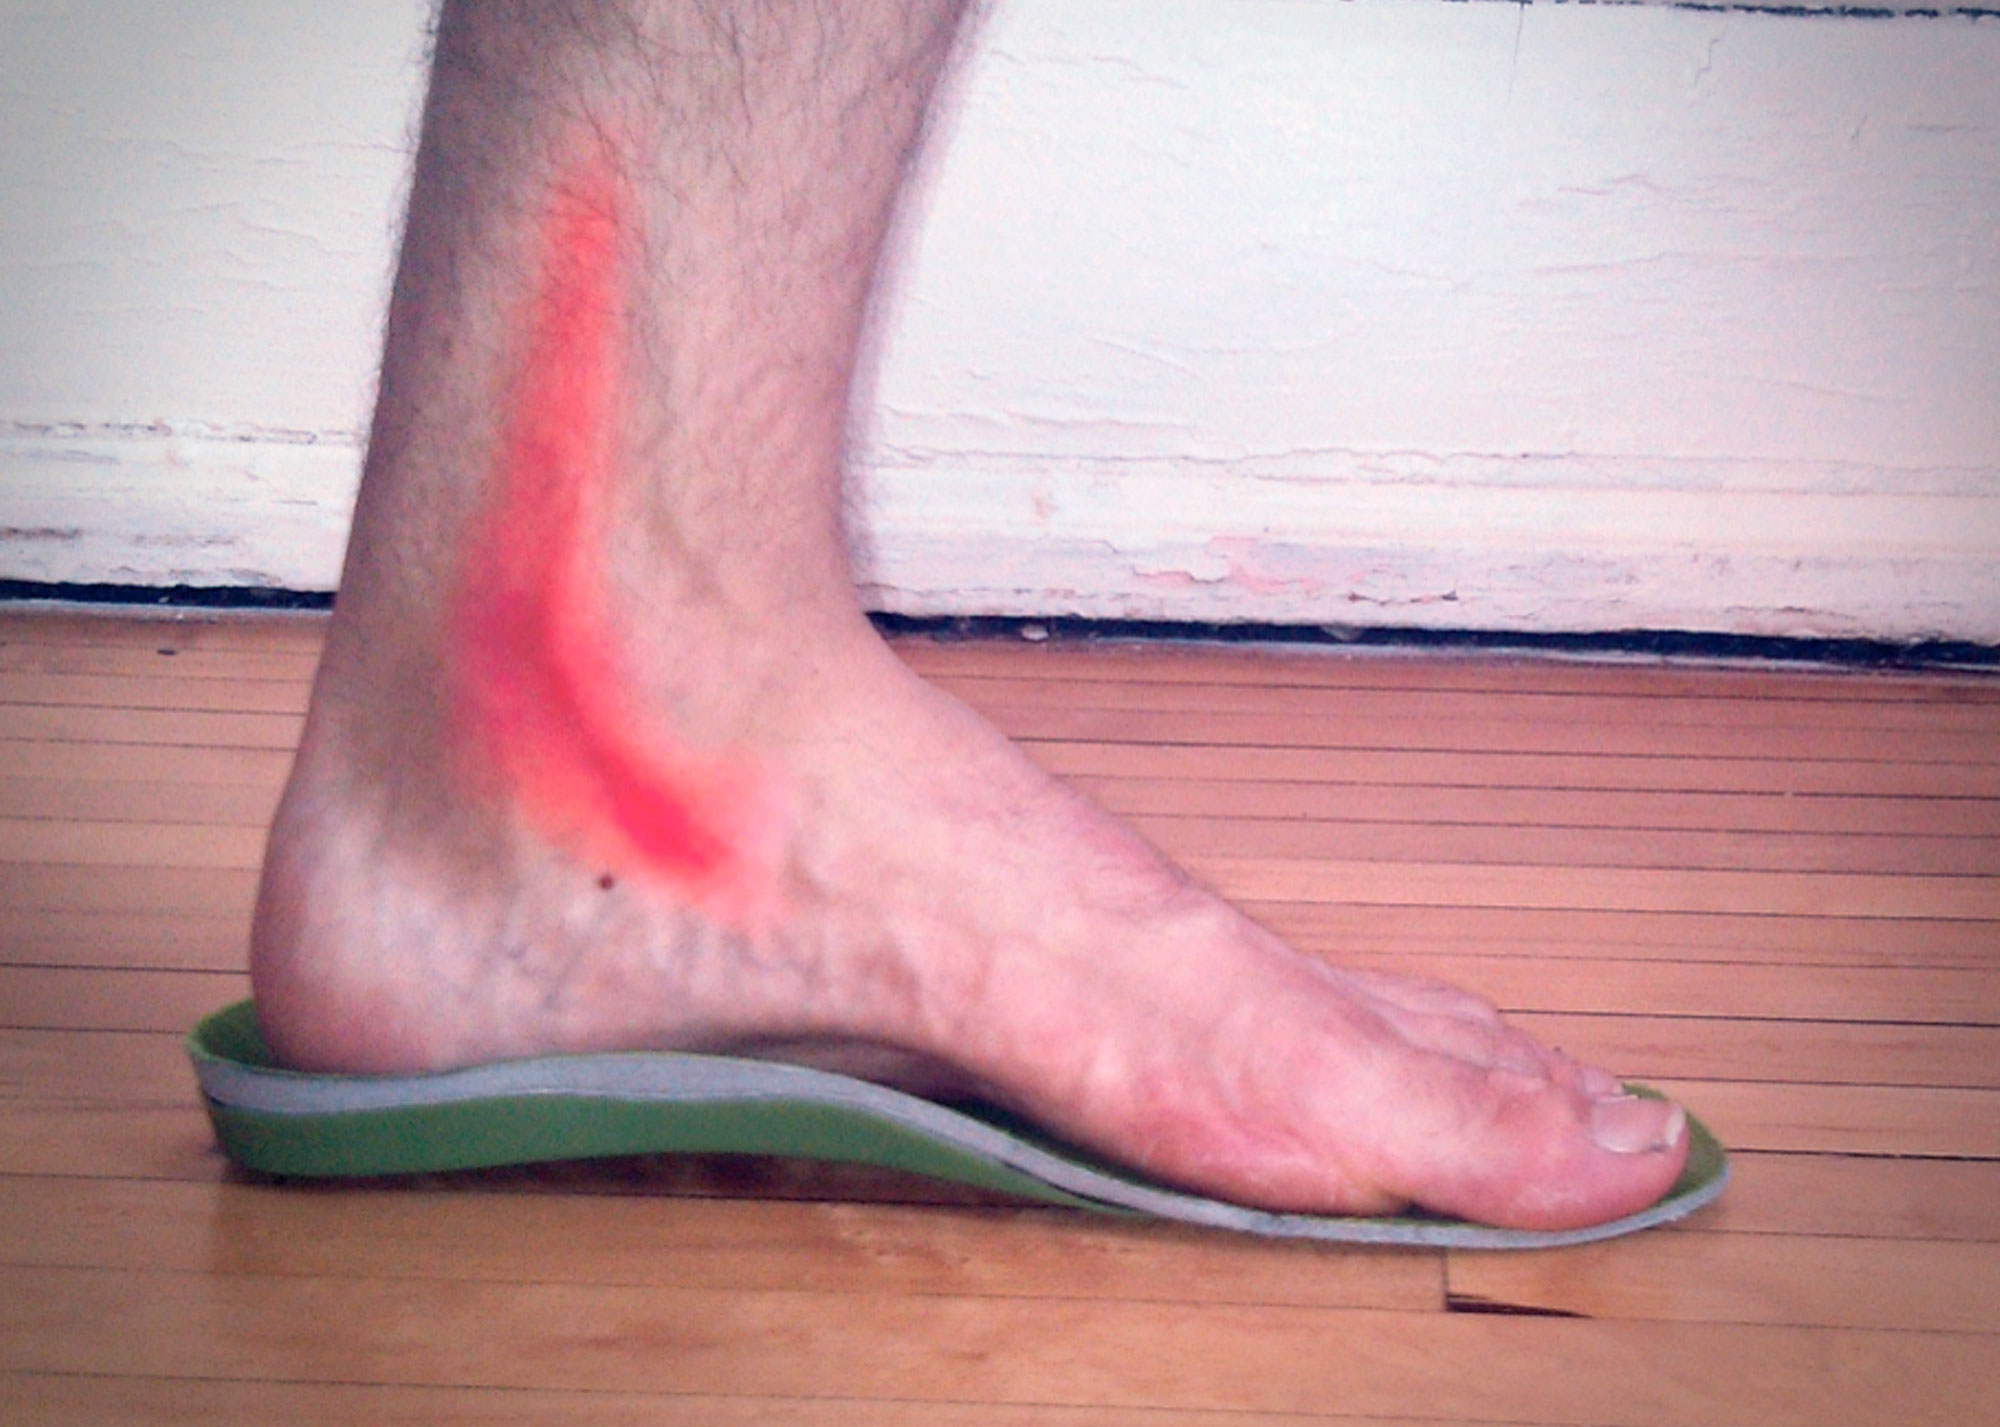 http://clinicadelpieembajadores.com/wp-content/uploads/2017/01/tendontibial.jpg